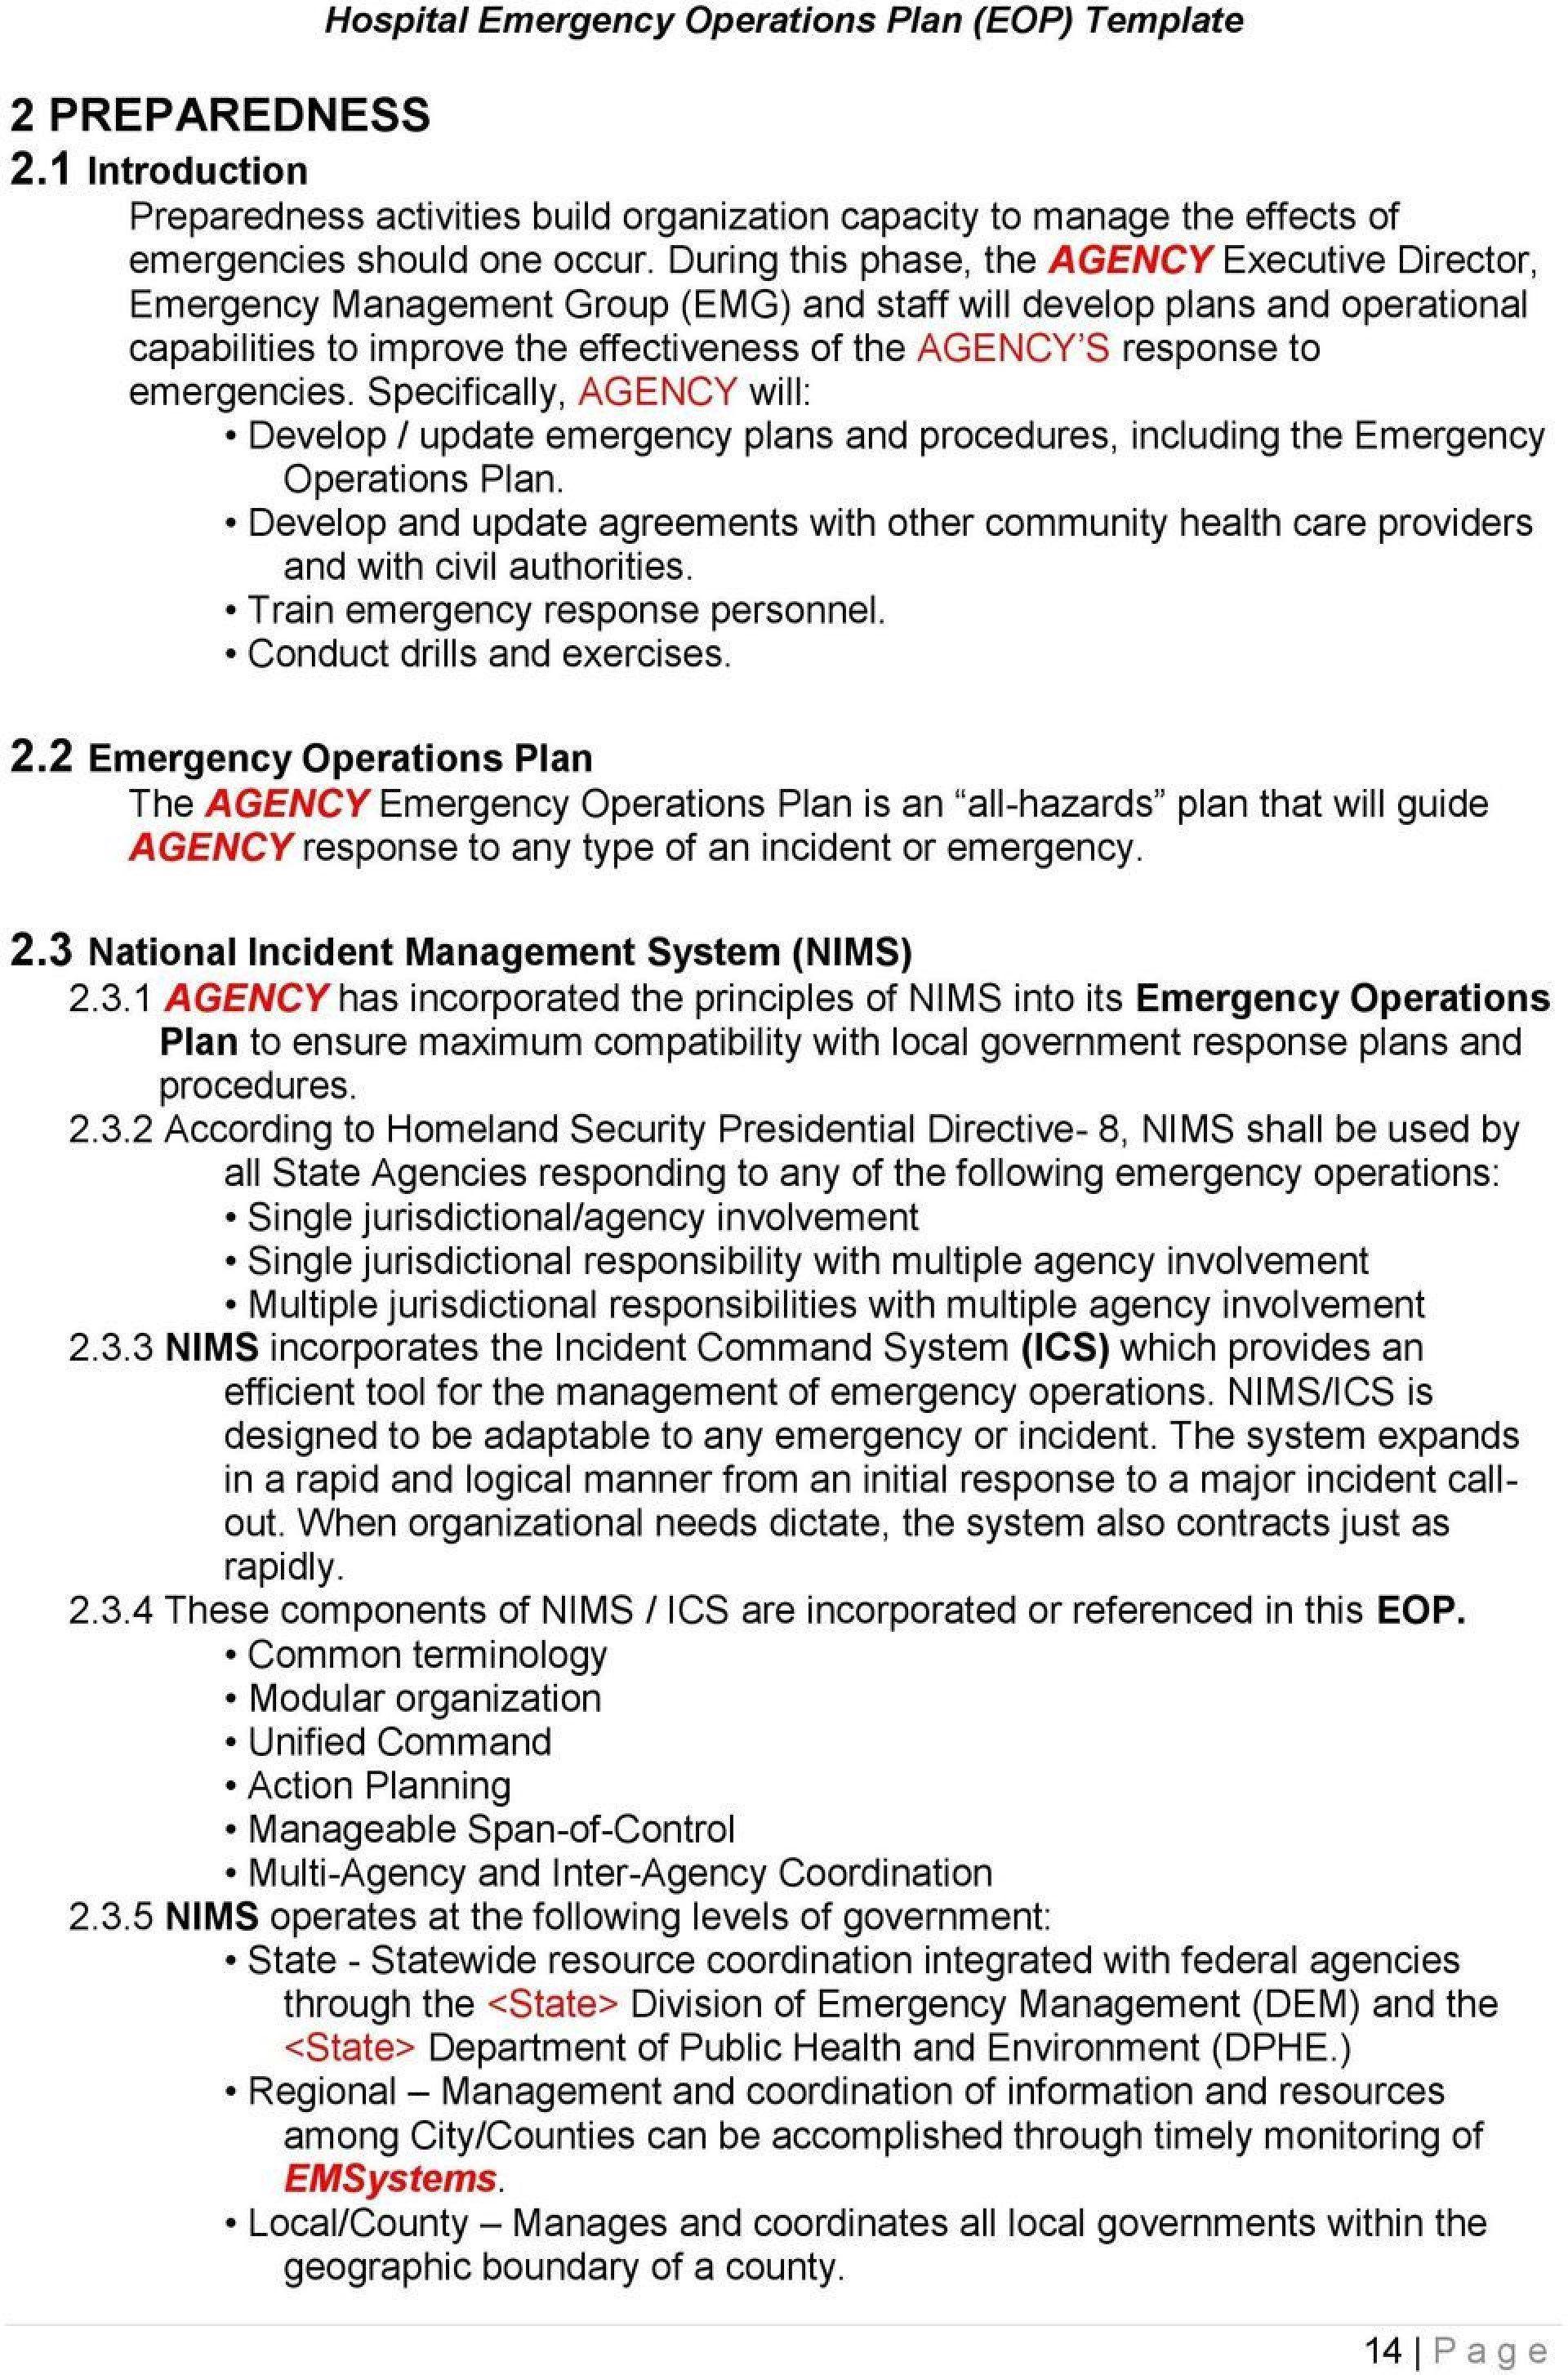 000 Sensational School Emergency Operation Plan Template Michigan High Resolution Full